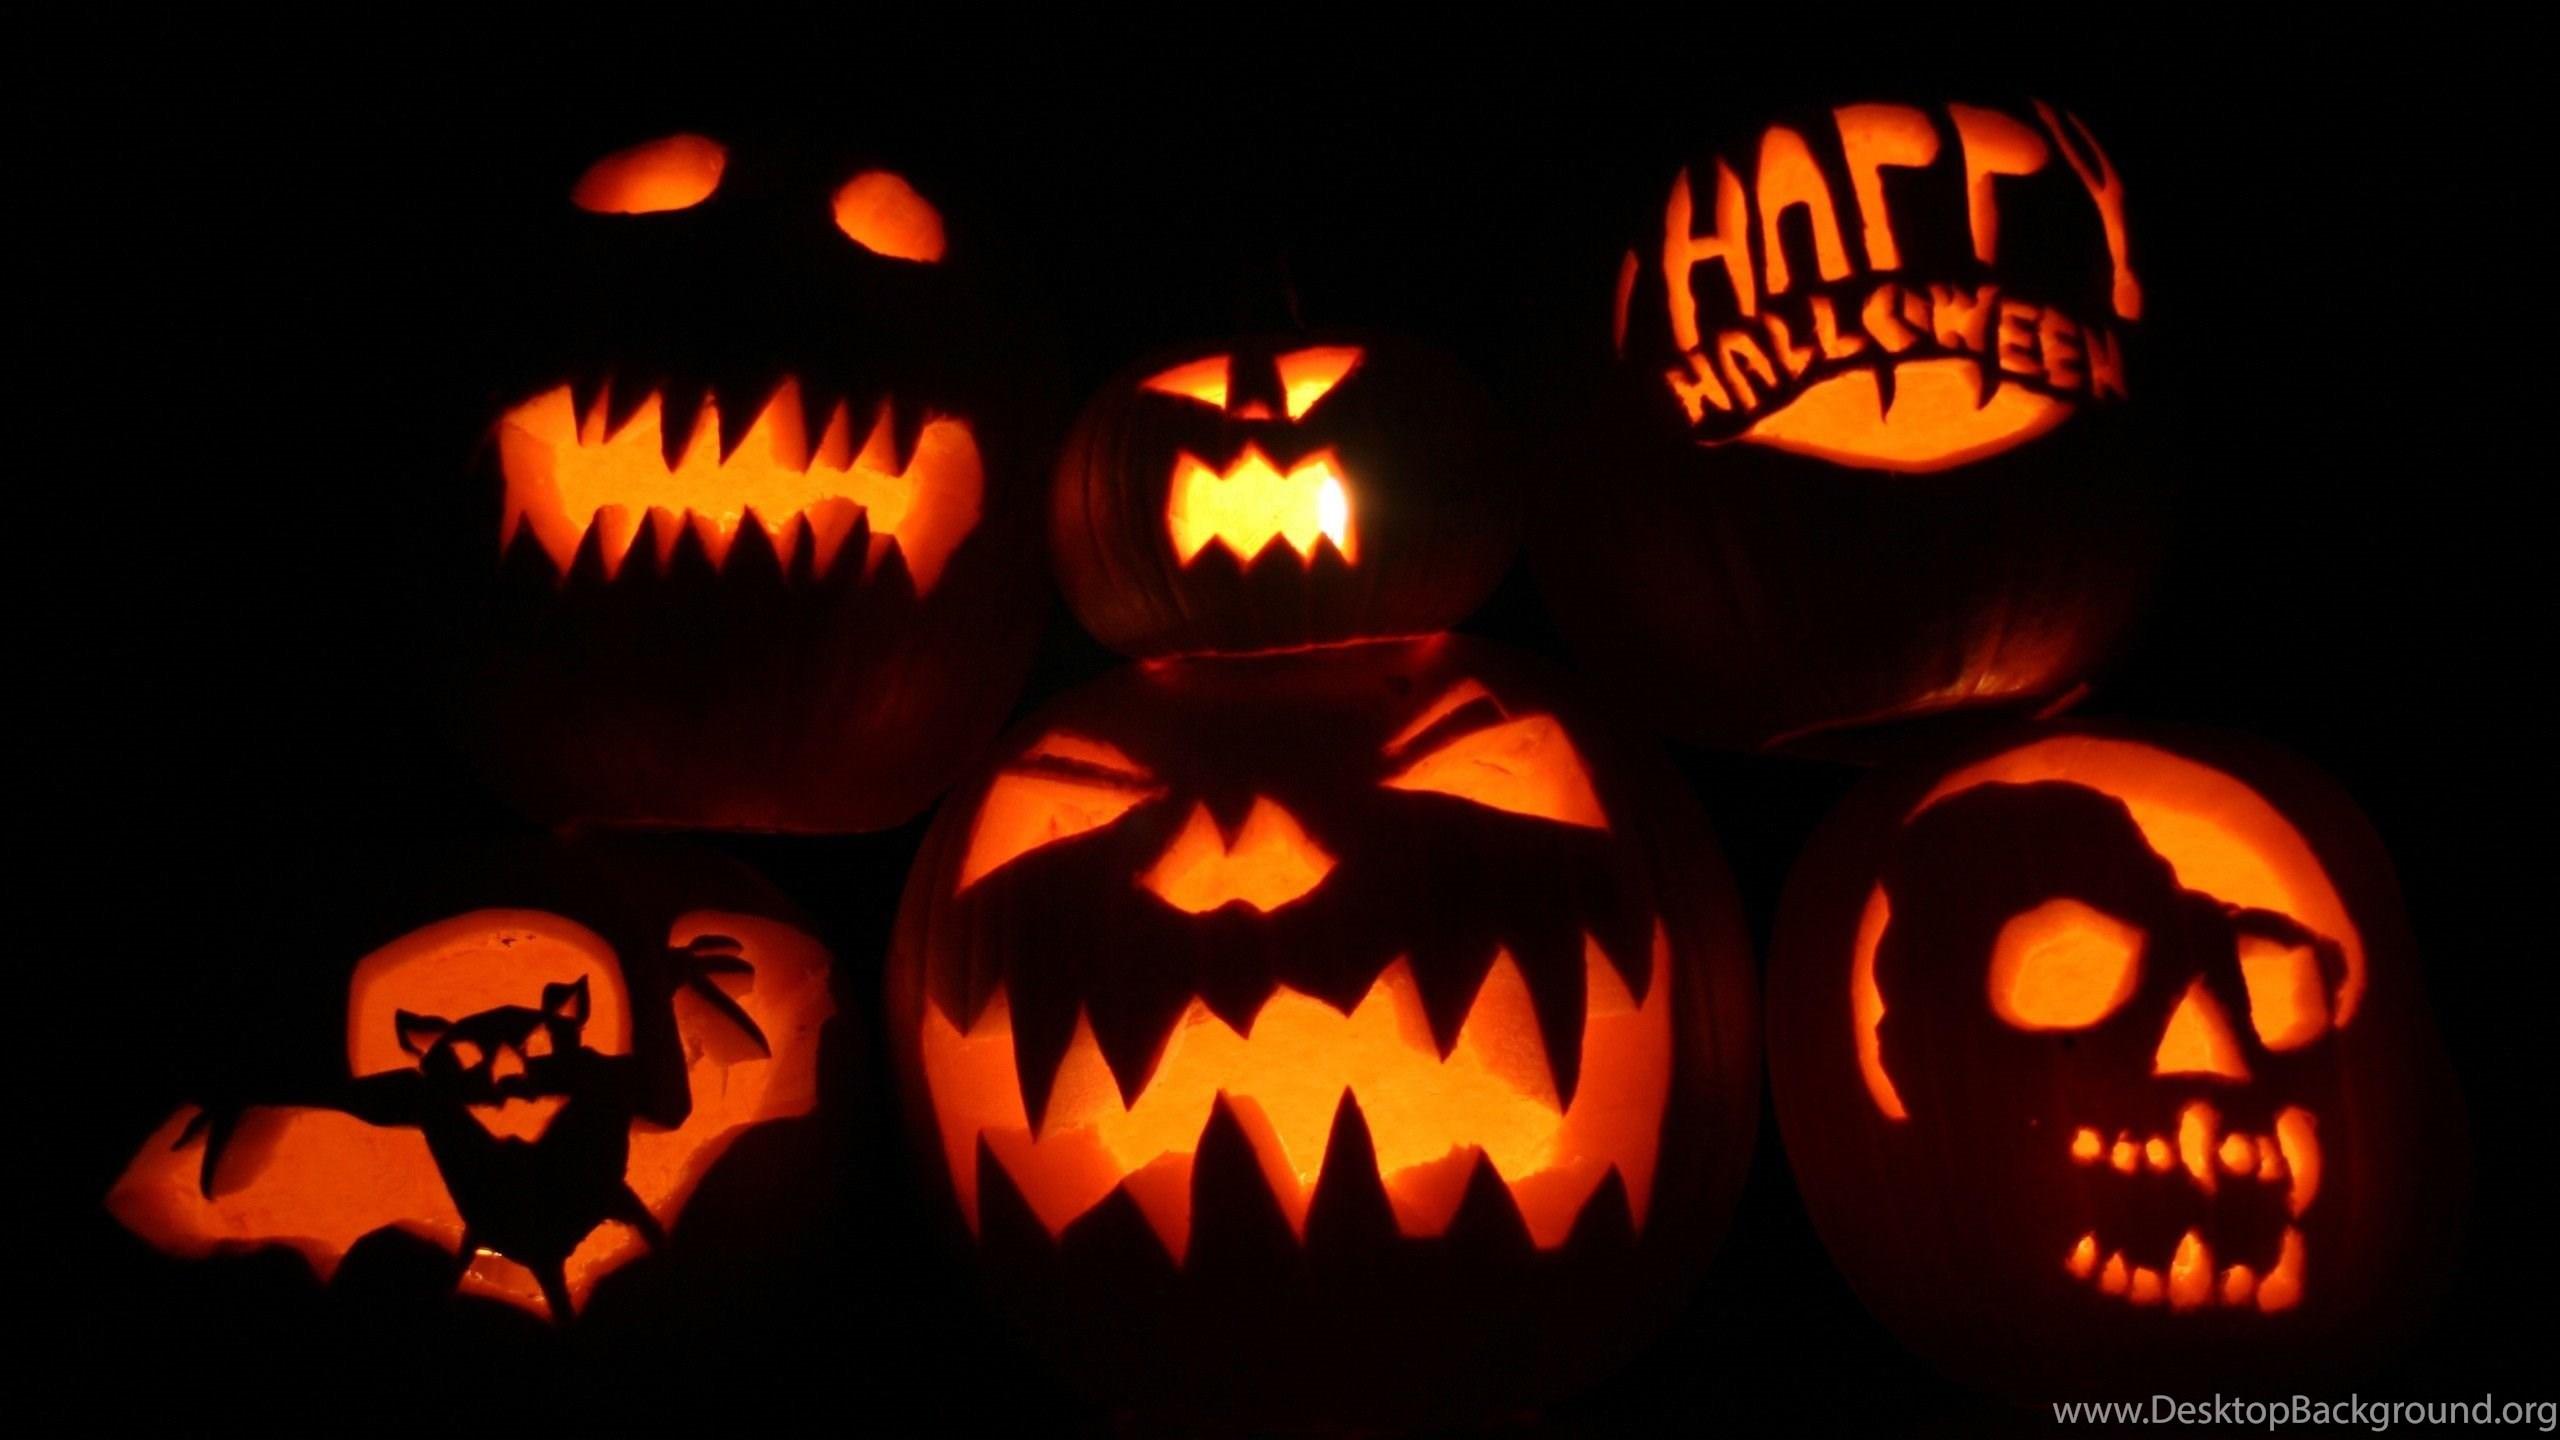 Fantastic Wallpaper Halloween Tablet - 192480_halloween-wallpapers-halloween-pumpkin-cartoon-photos-big_2560x1600_h  Image_481215.jpg